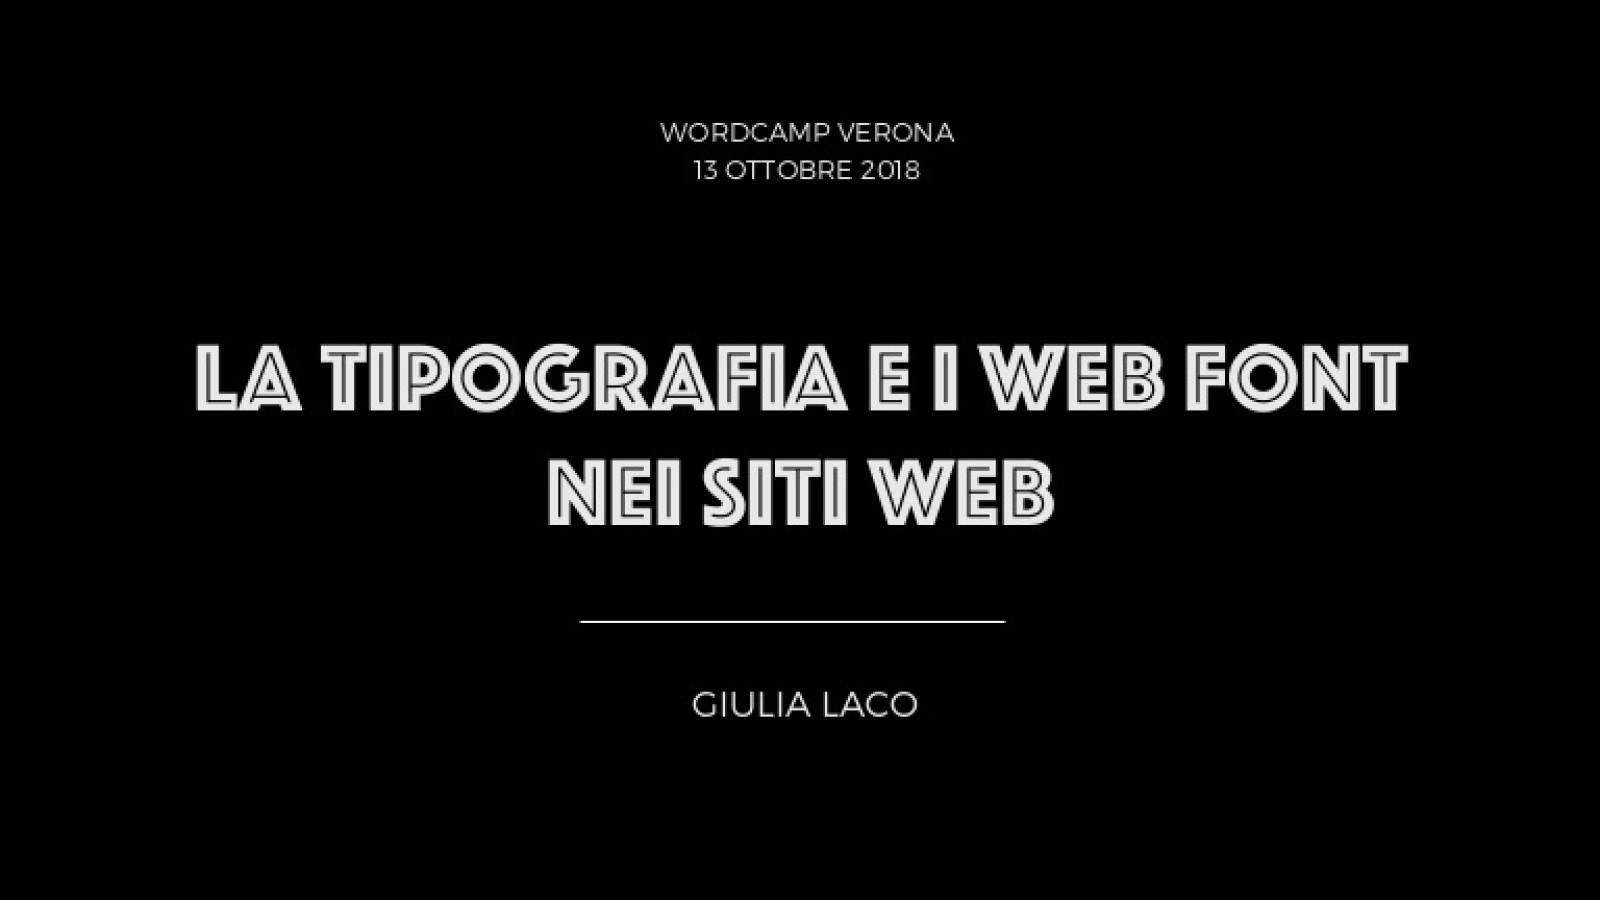 La tipografia e i web font nei siti web